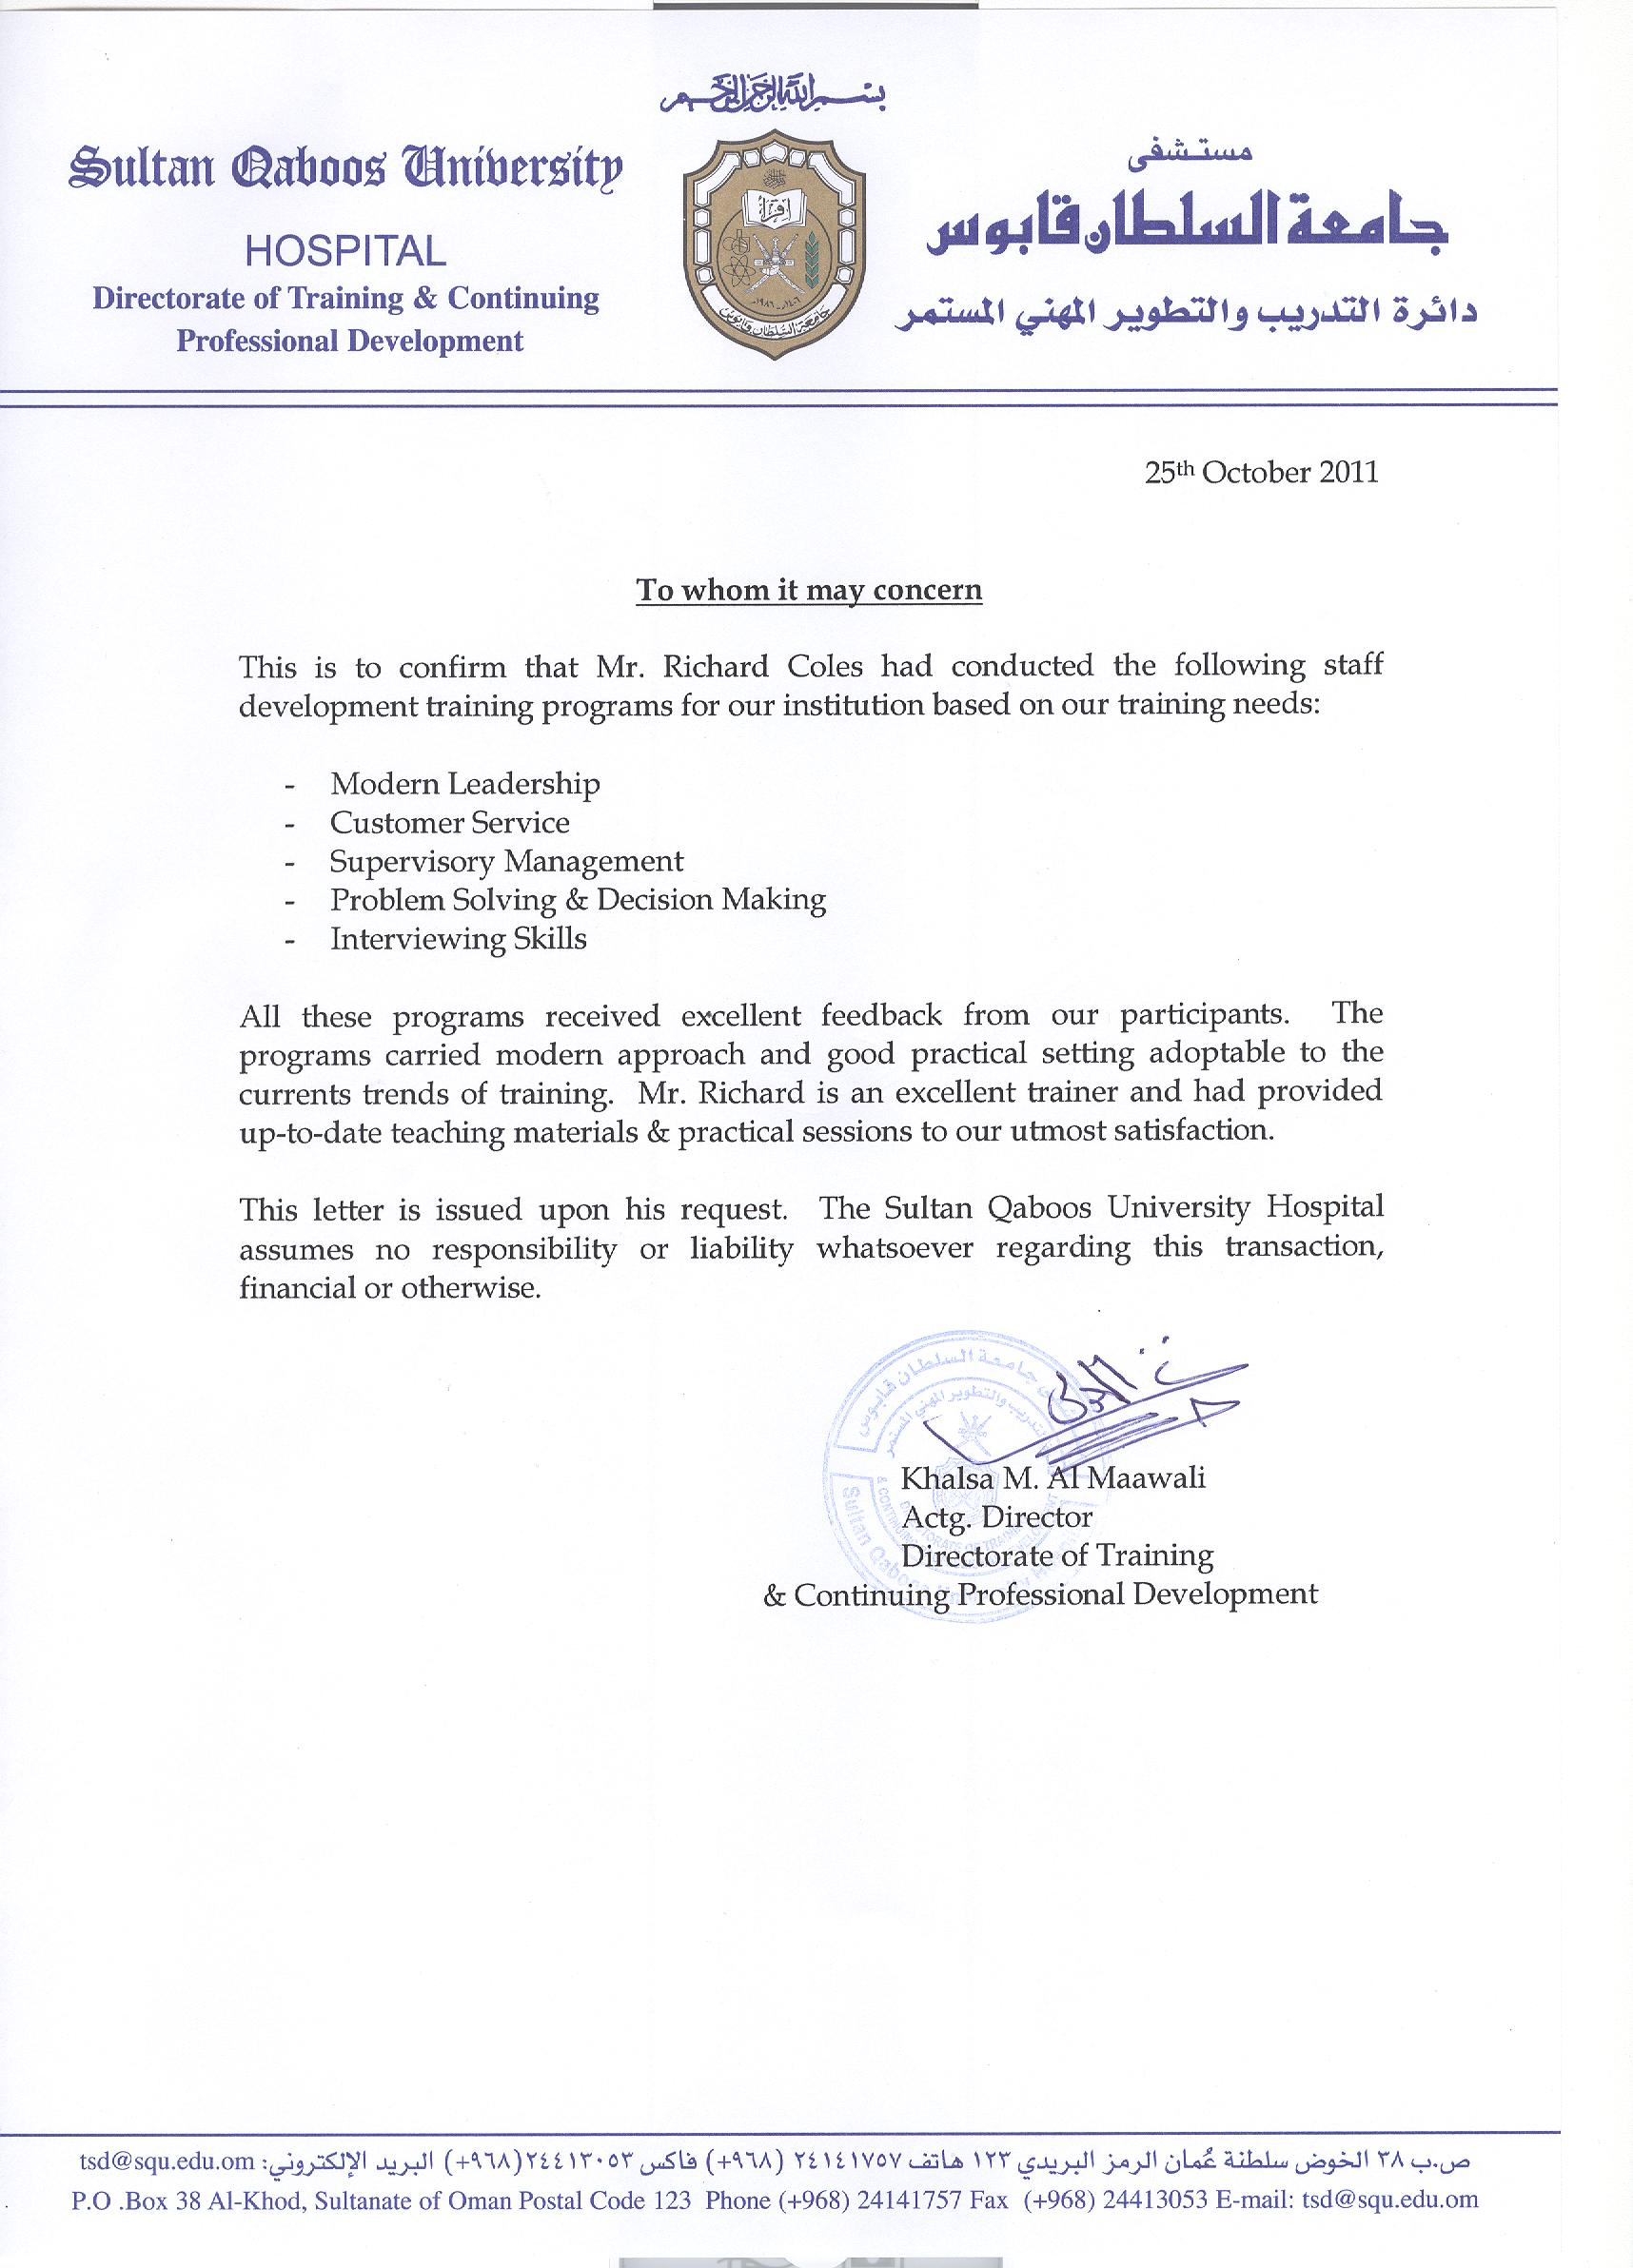 coles training  u2013 testimonial documents